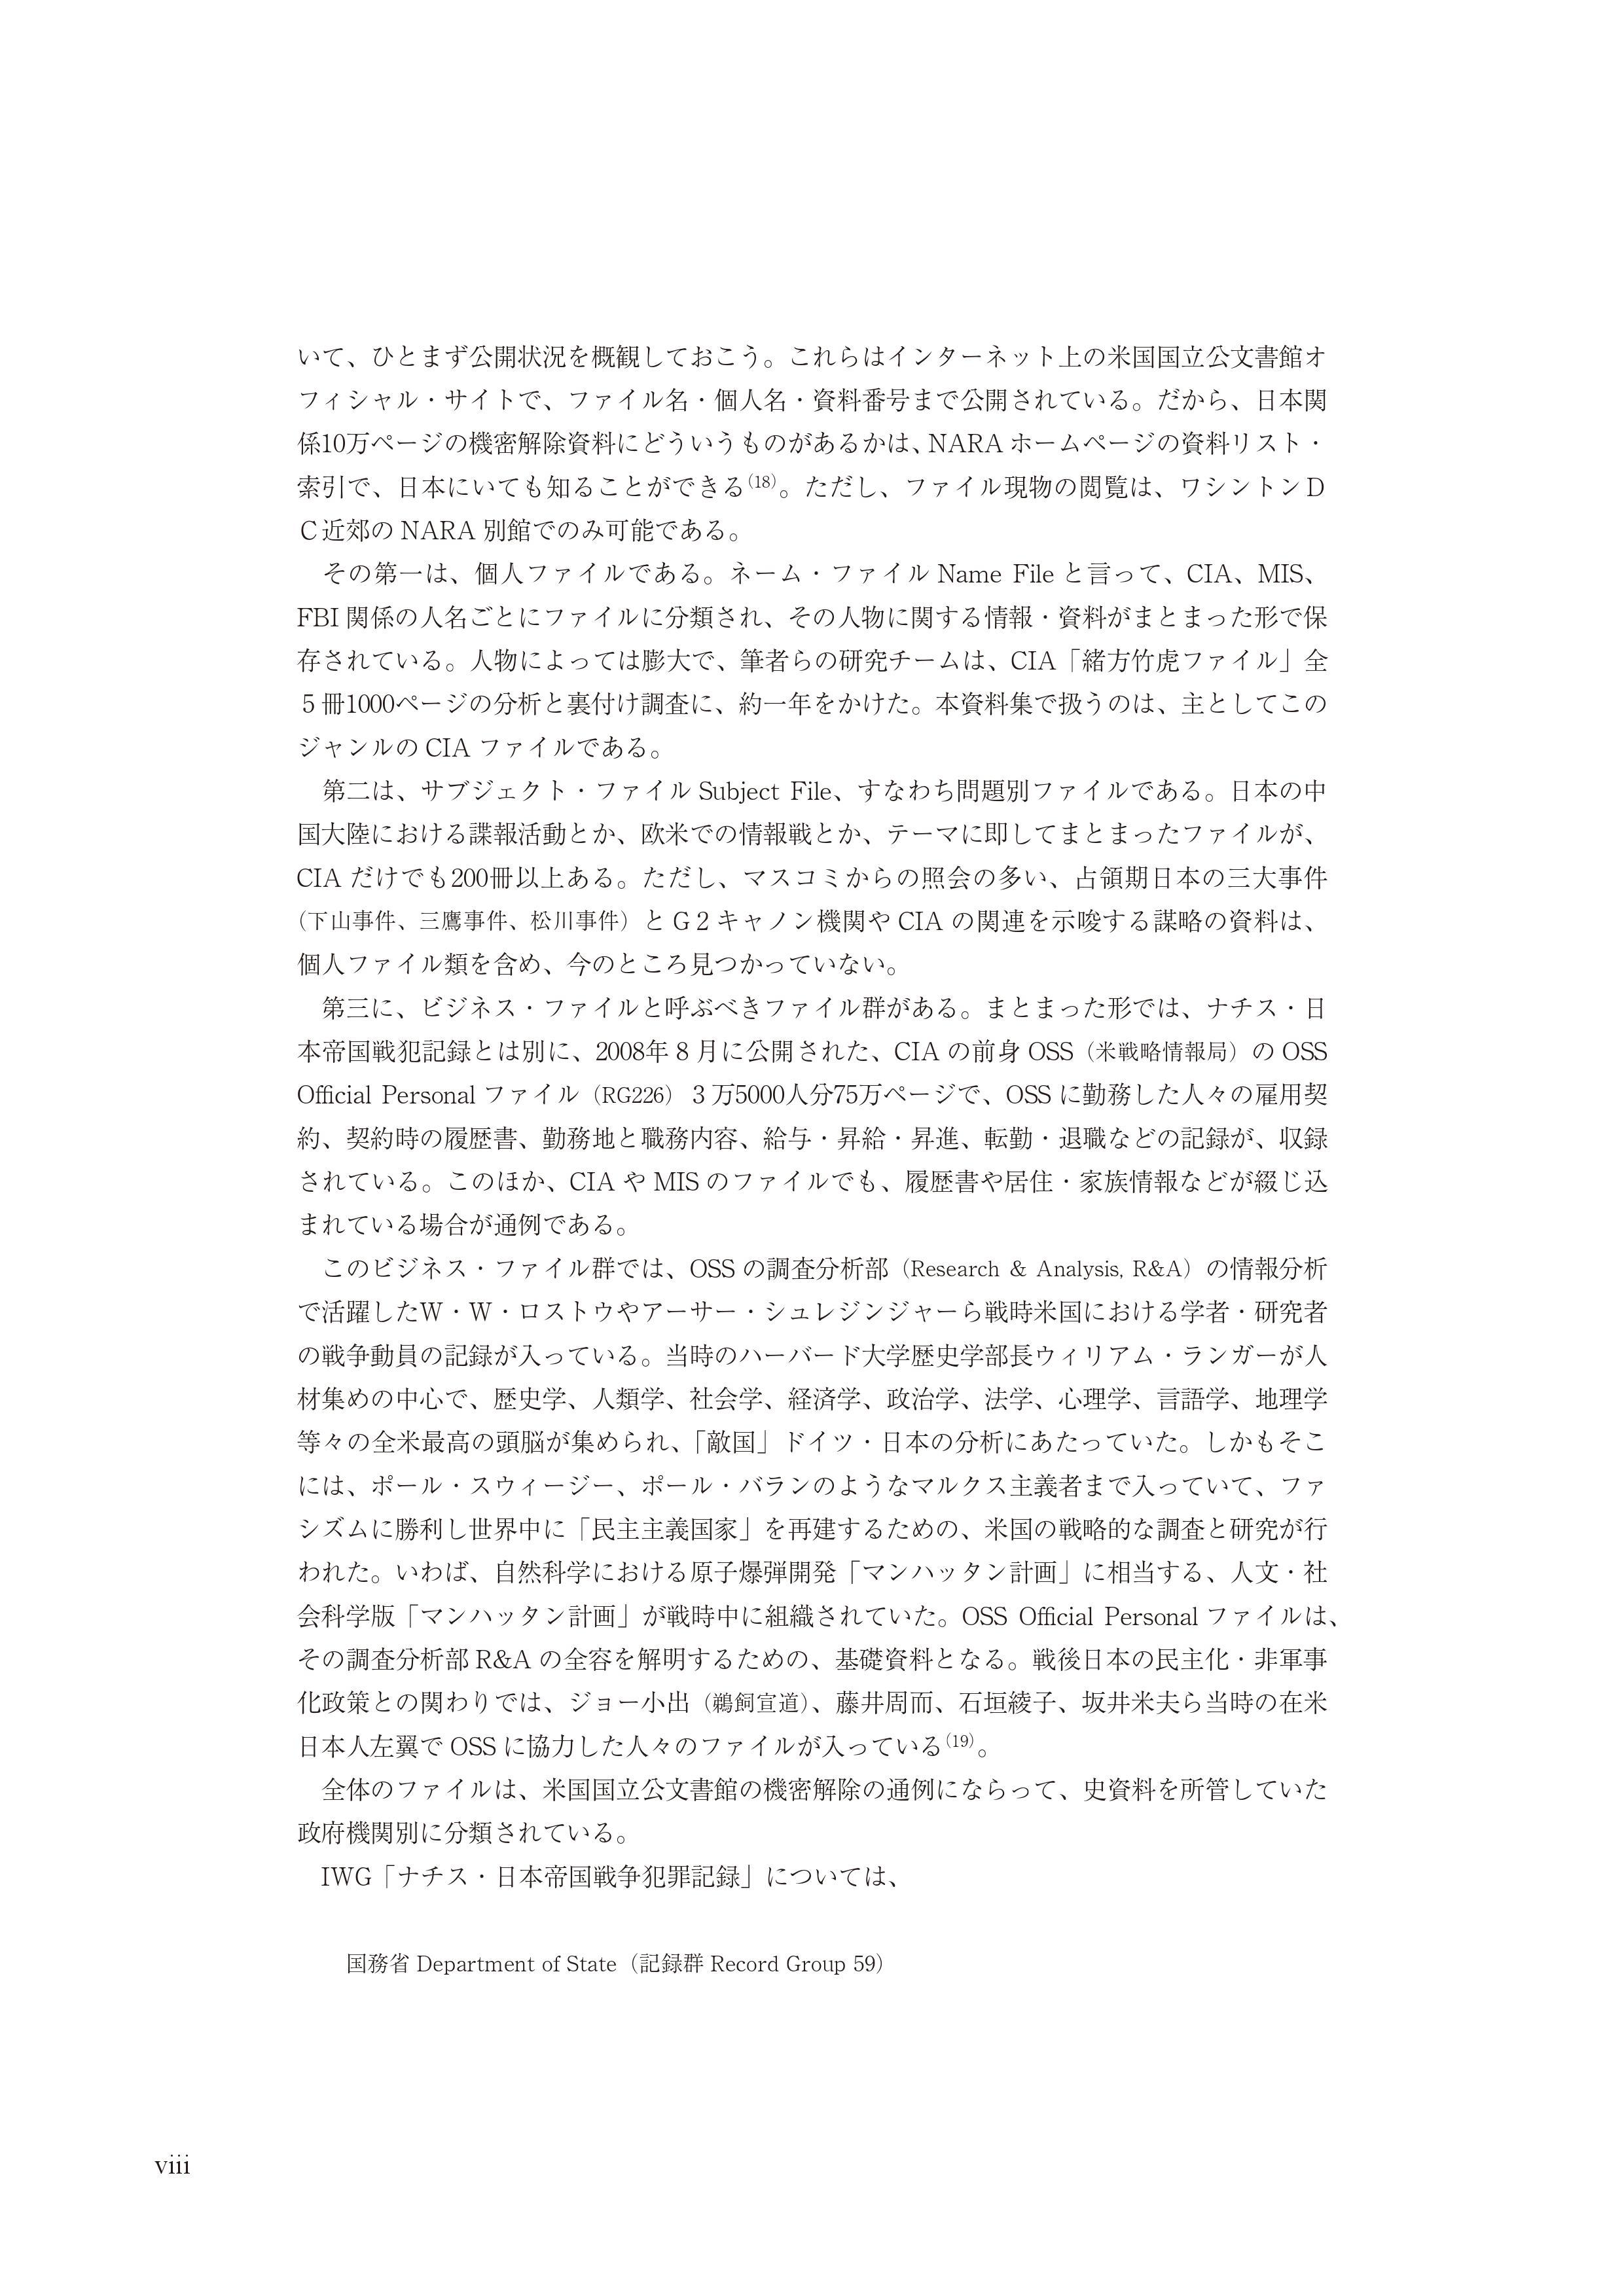 CIA日本人ファイル0001 (8)